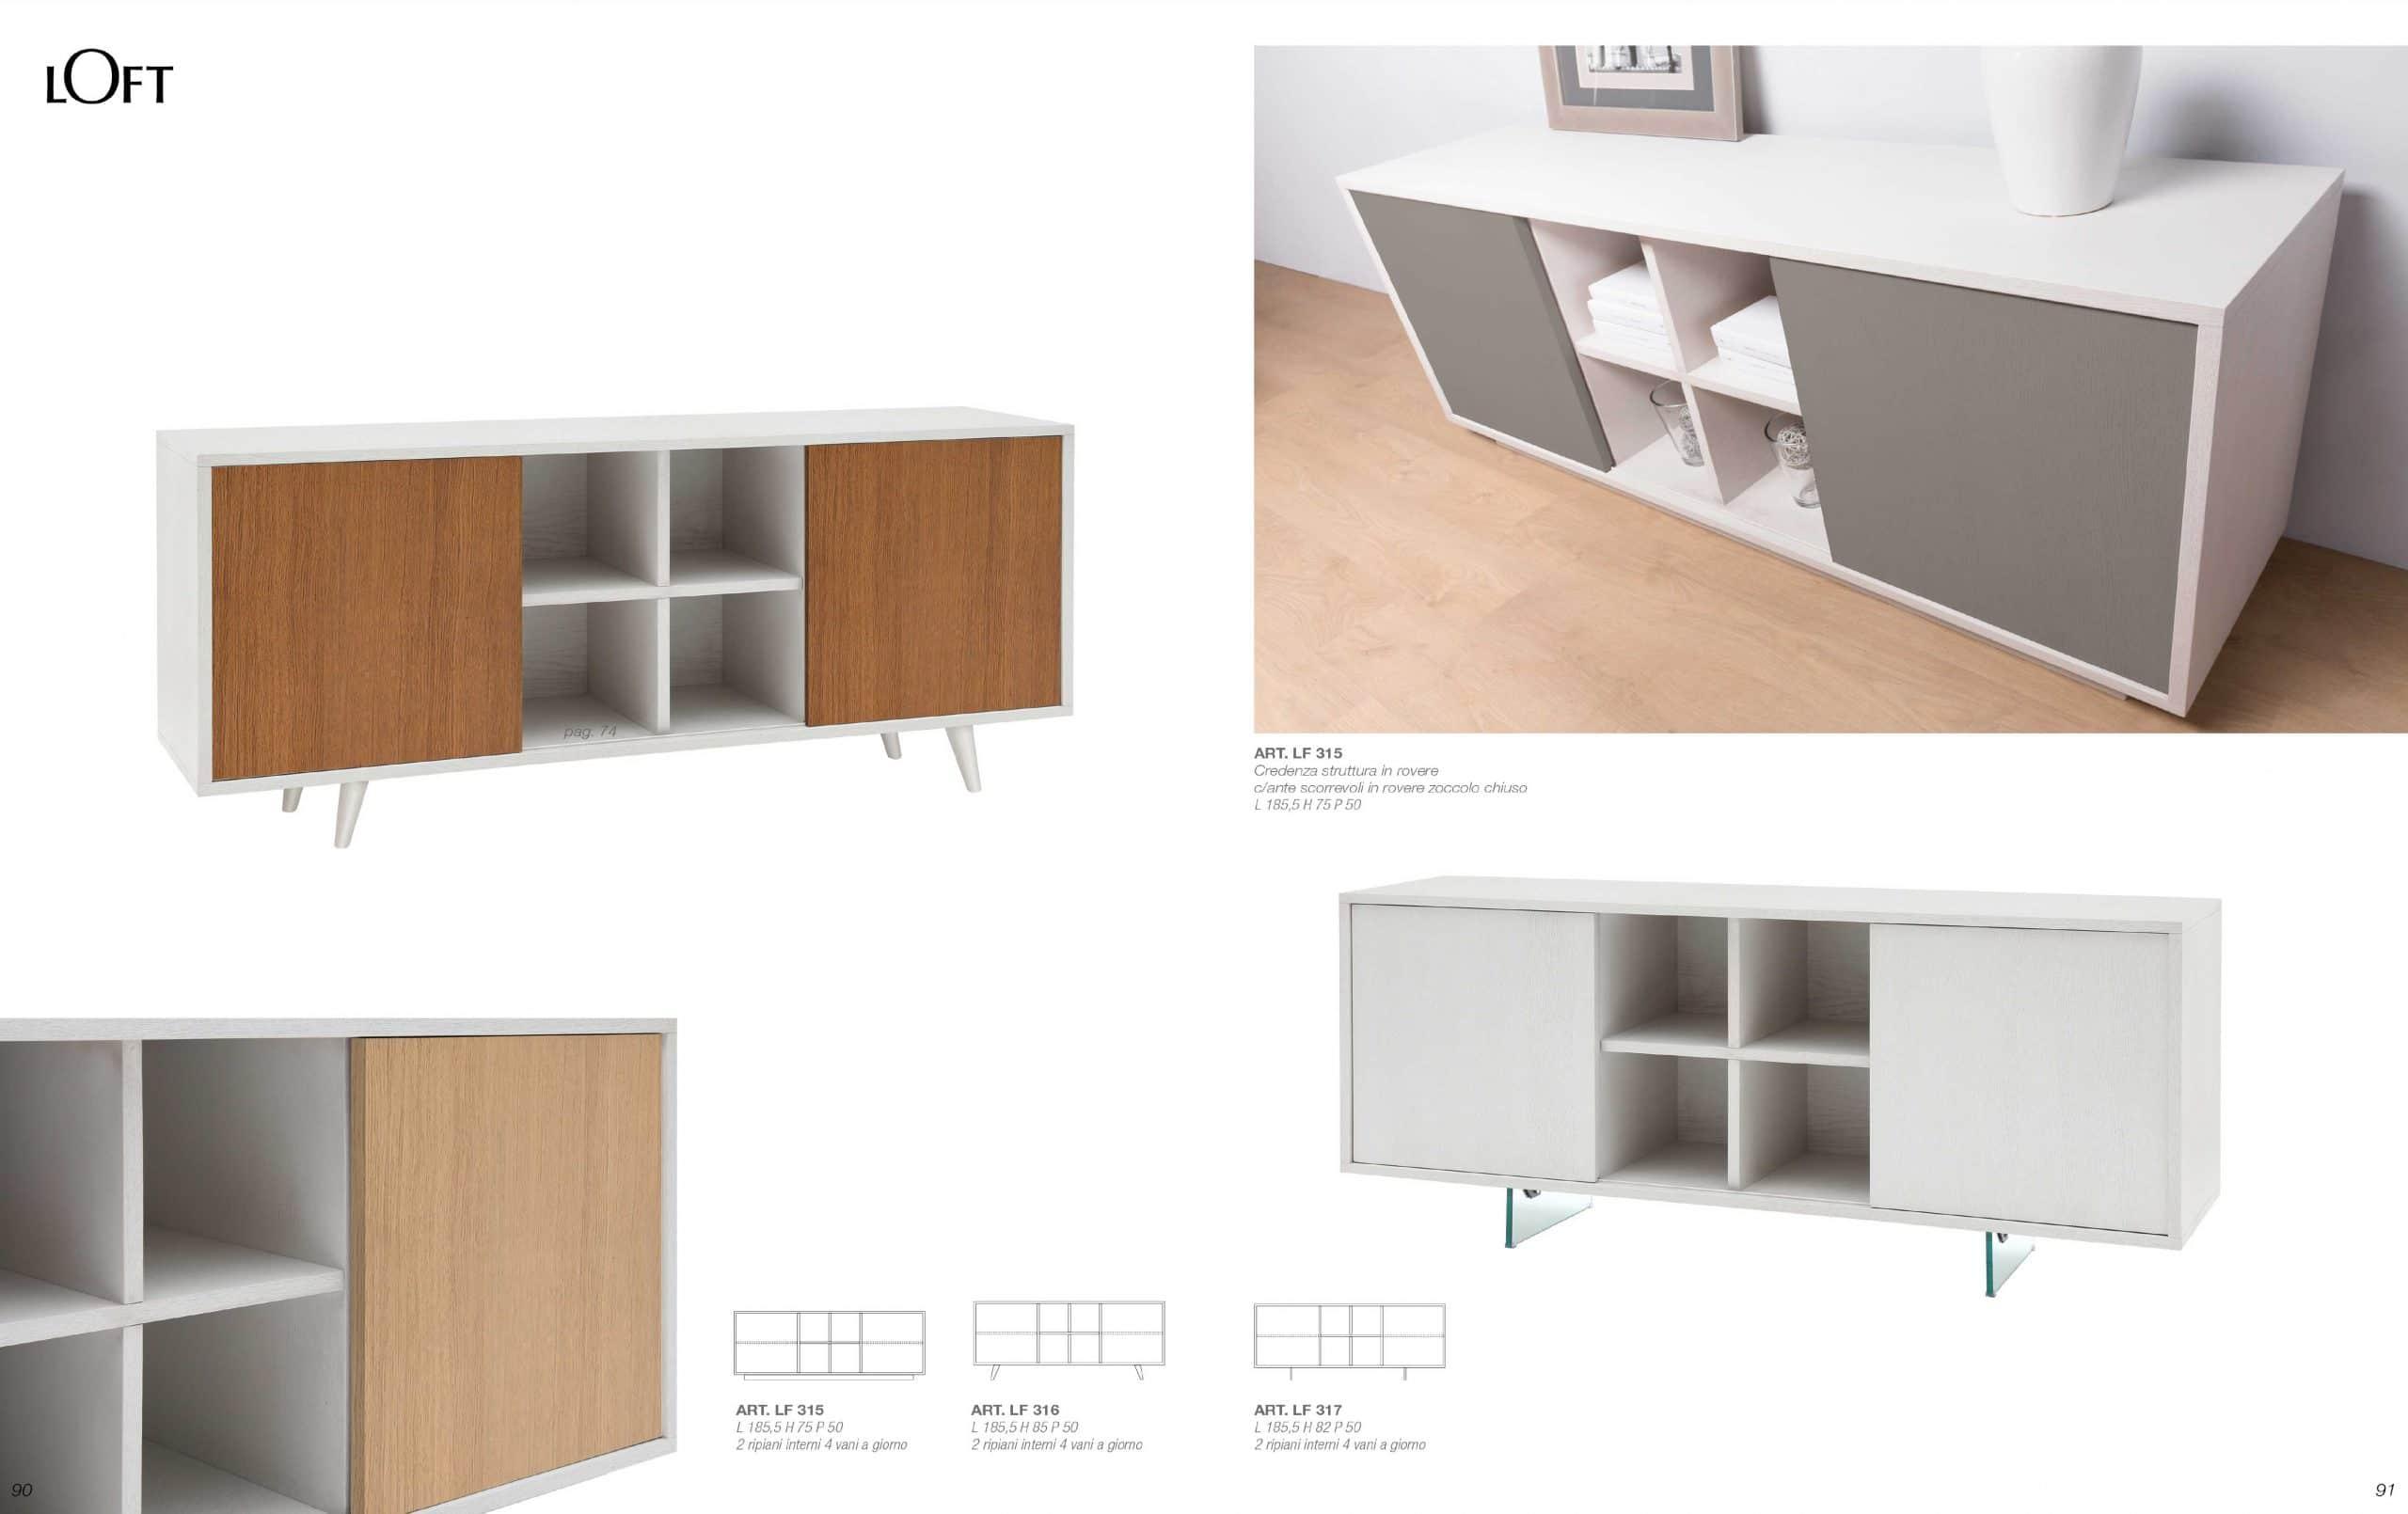 interni-creazione-brochure-a-padova